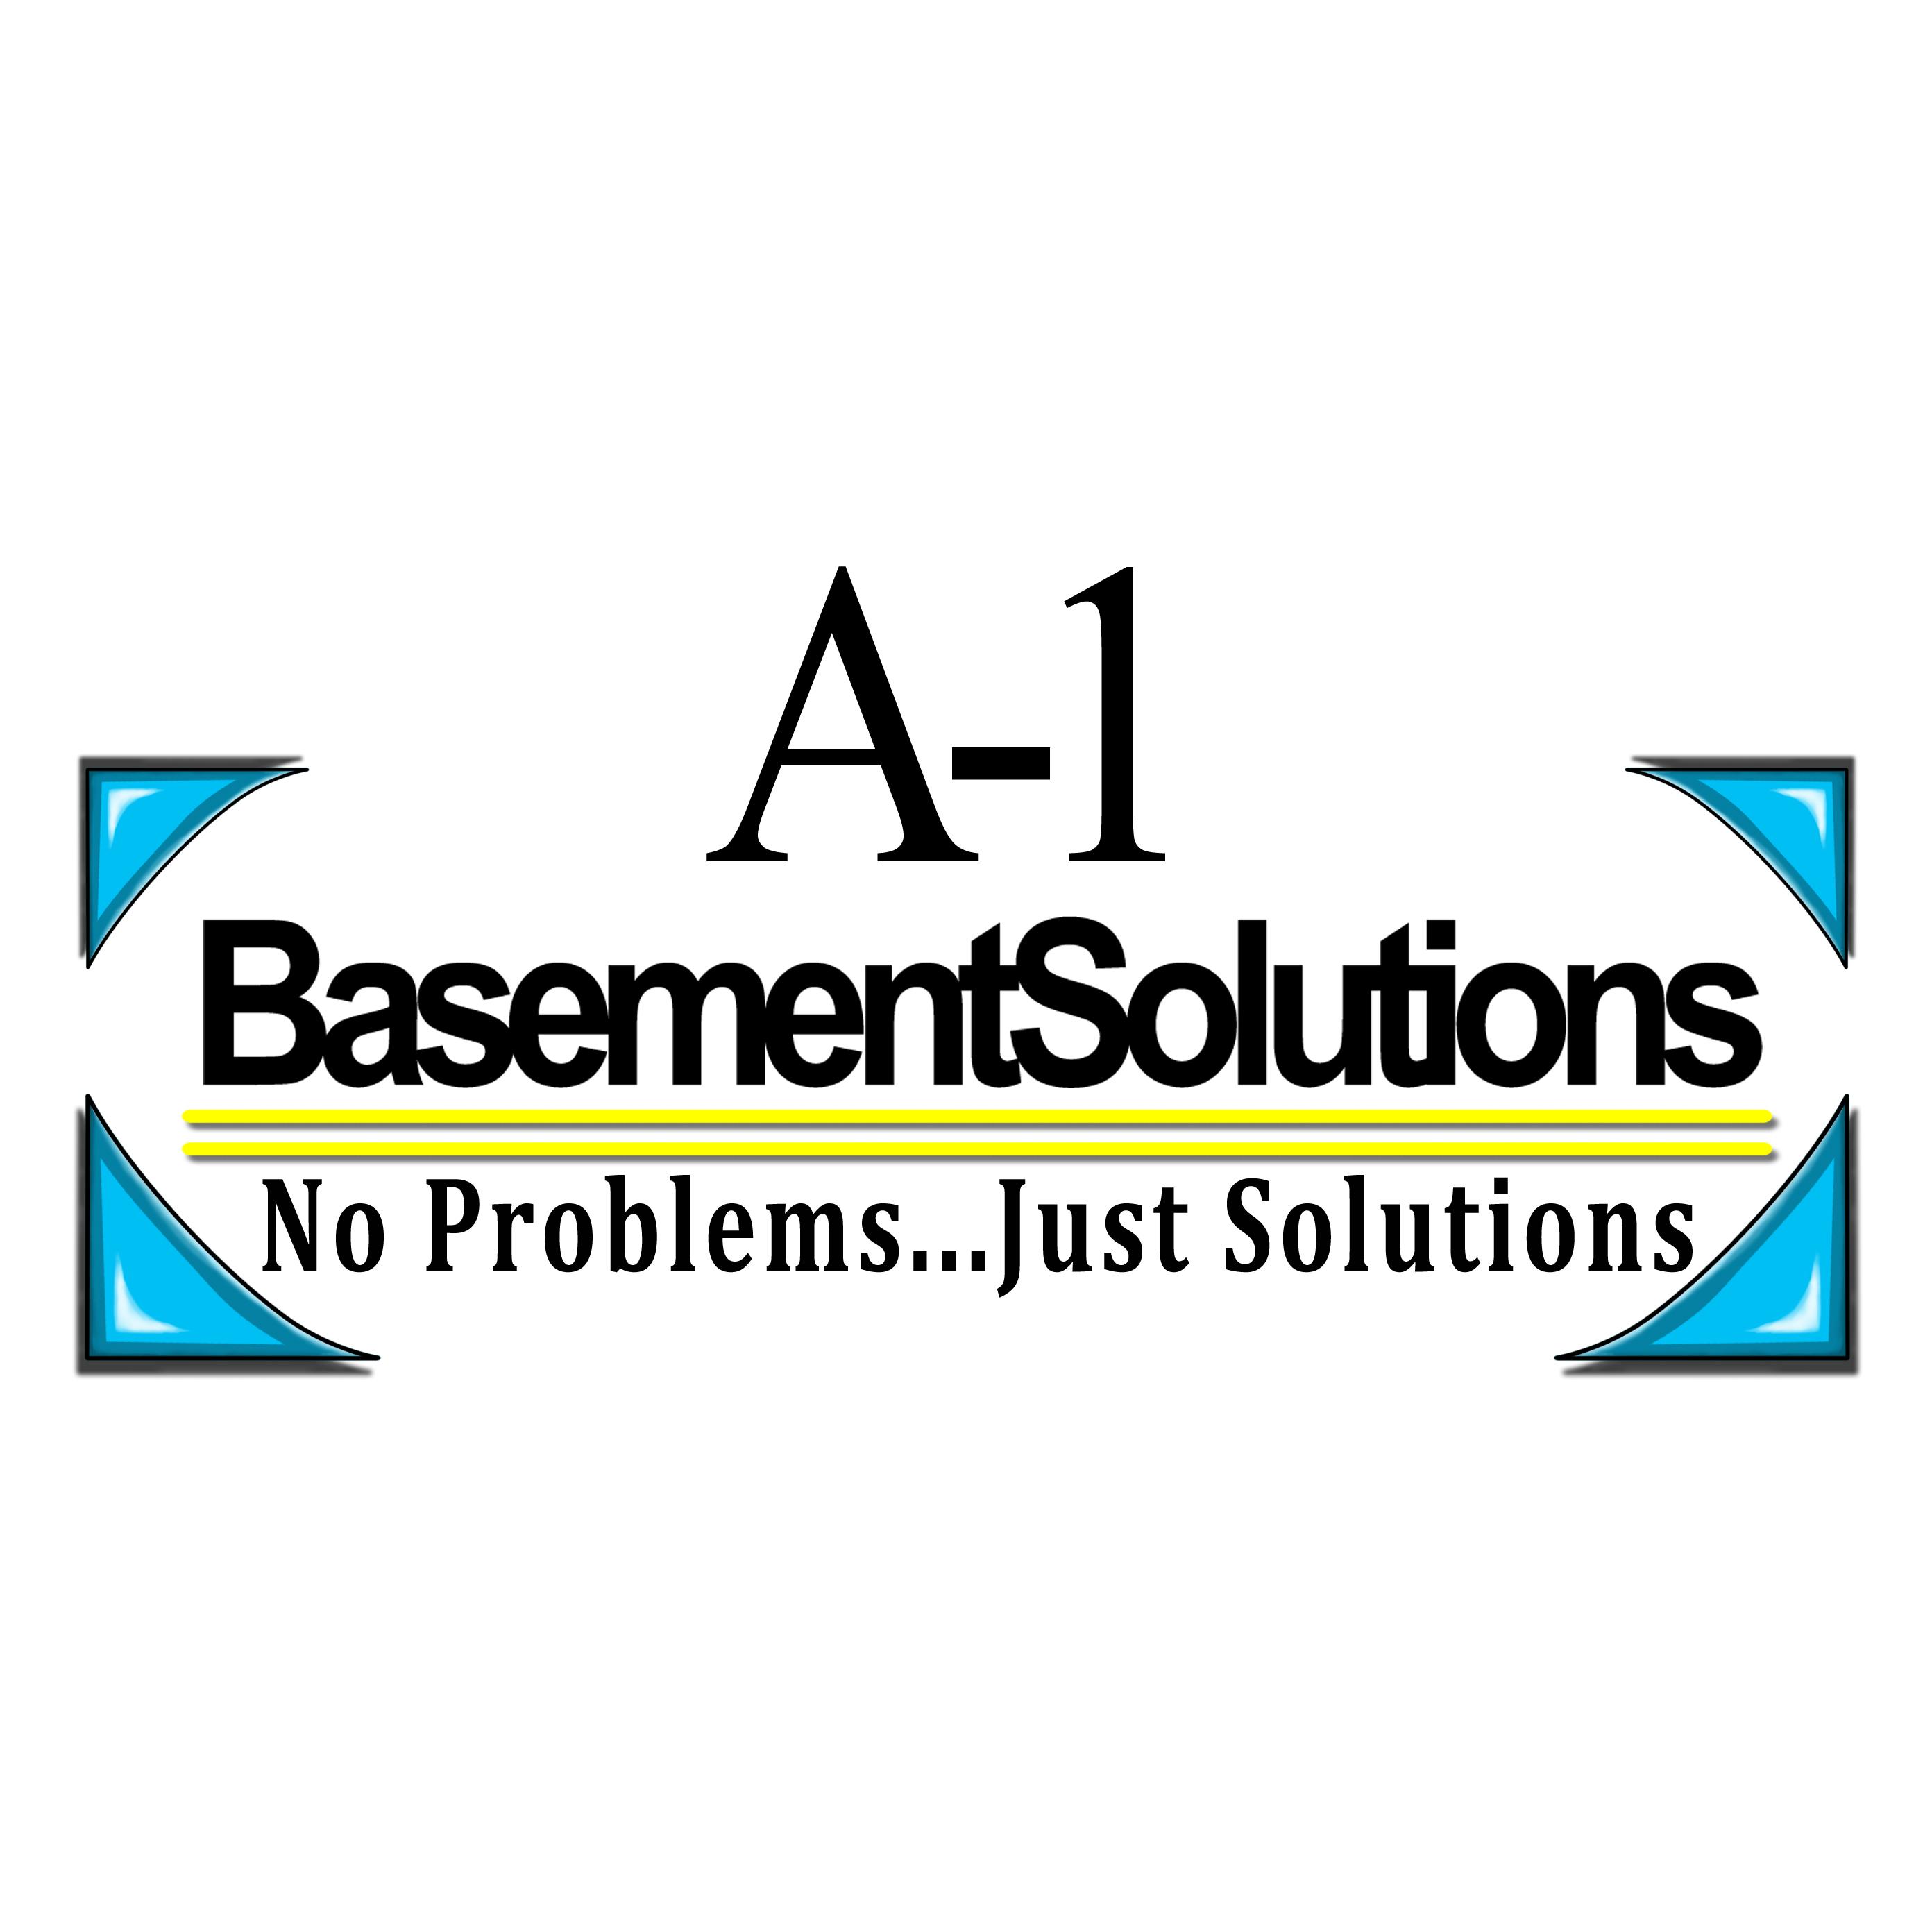 Foundation in NJ Scotch Plains 07076 A-1 Basement Solutions 1766 East 2nd St.  (908)322-1313